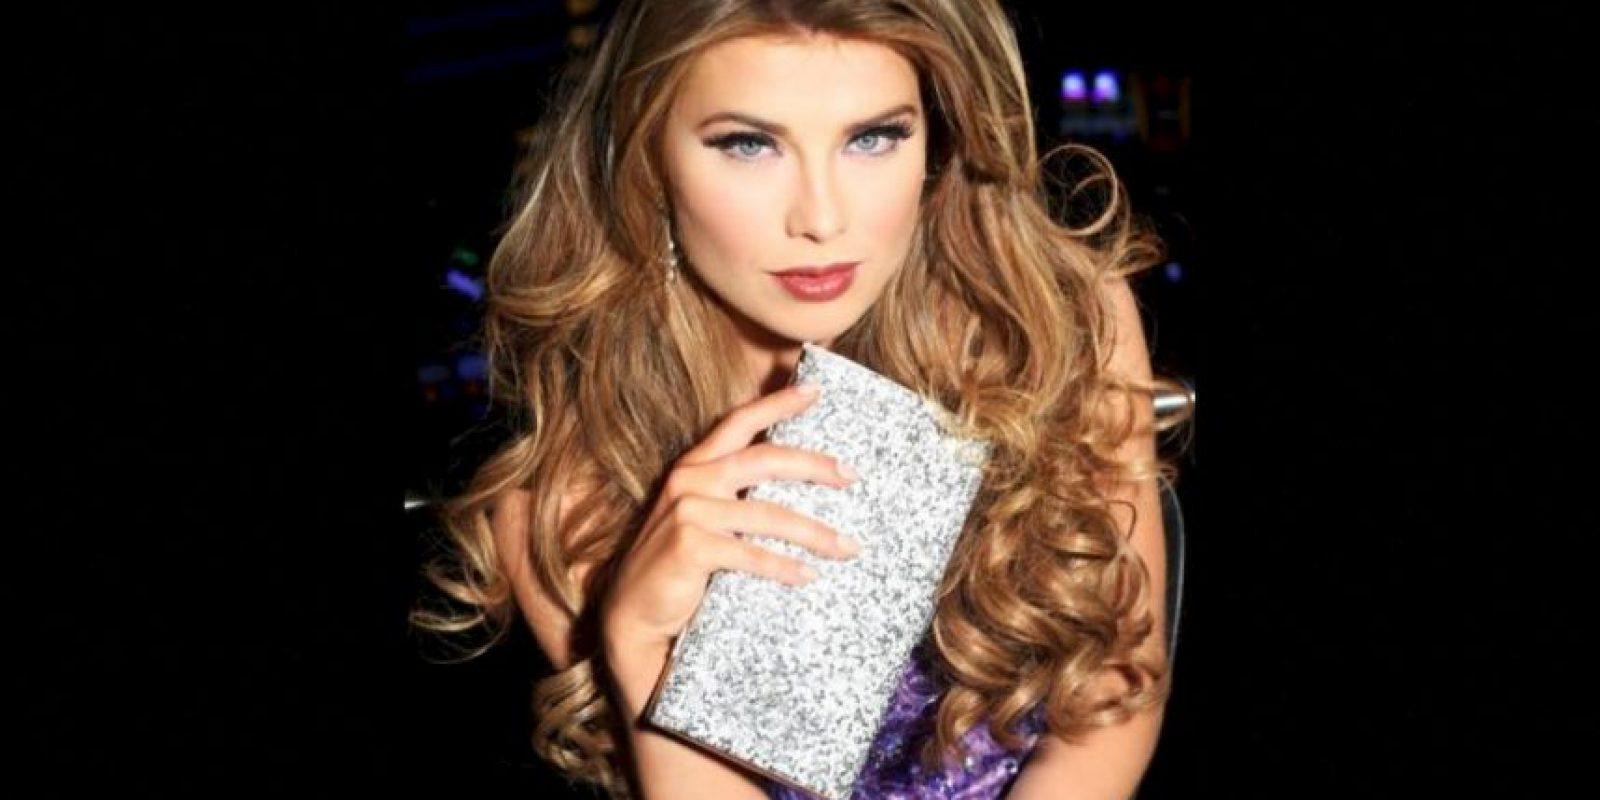 Cecilie Wellemberg es Miss Dinamarca Foto:Facebook.com/MissUniverse